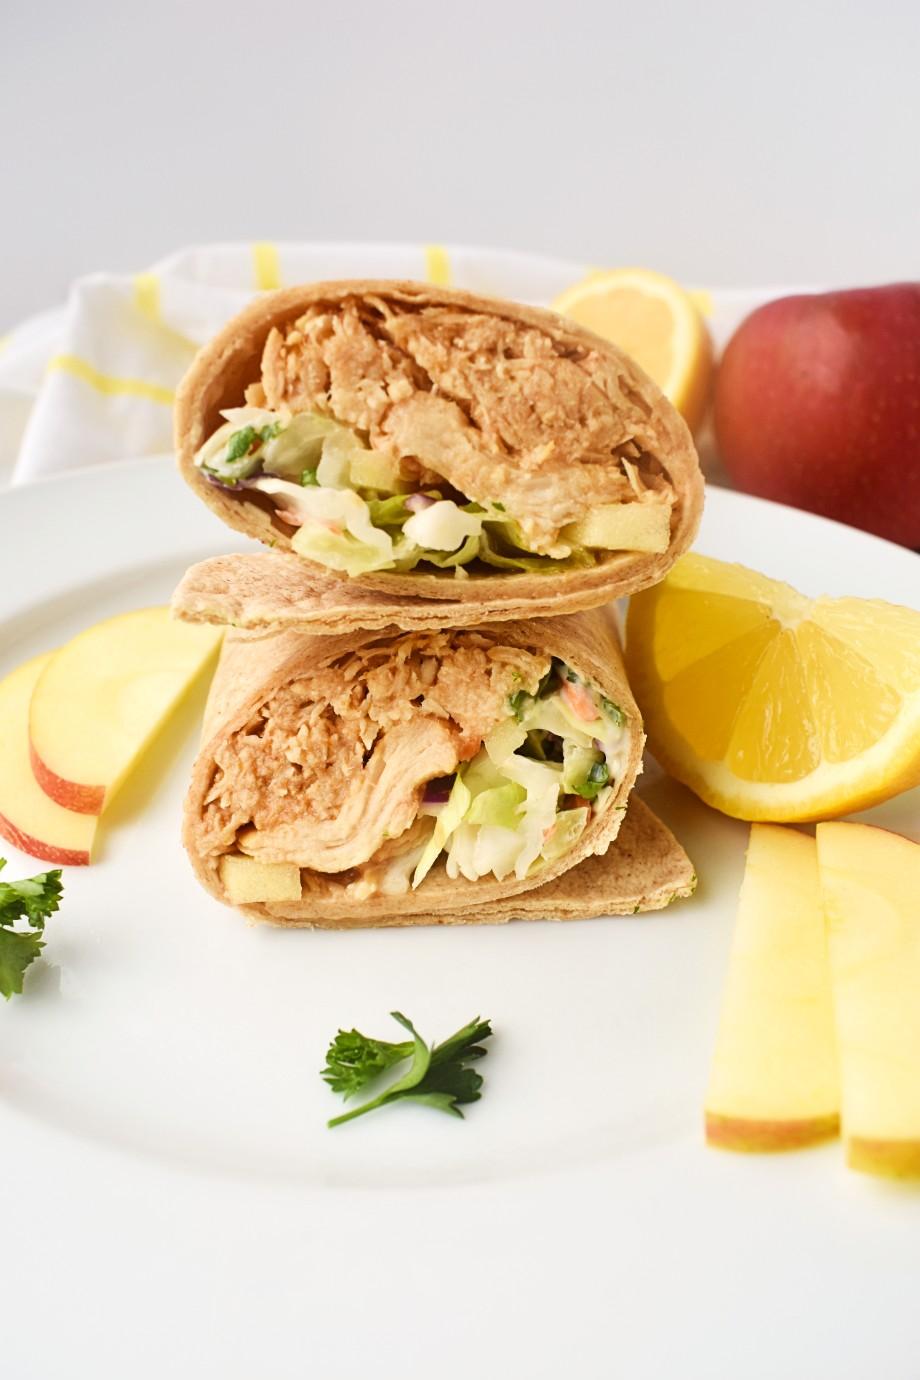 BBQ Chicken Wraps with Lemon Coleslaw